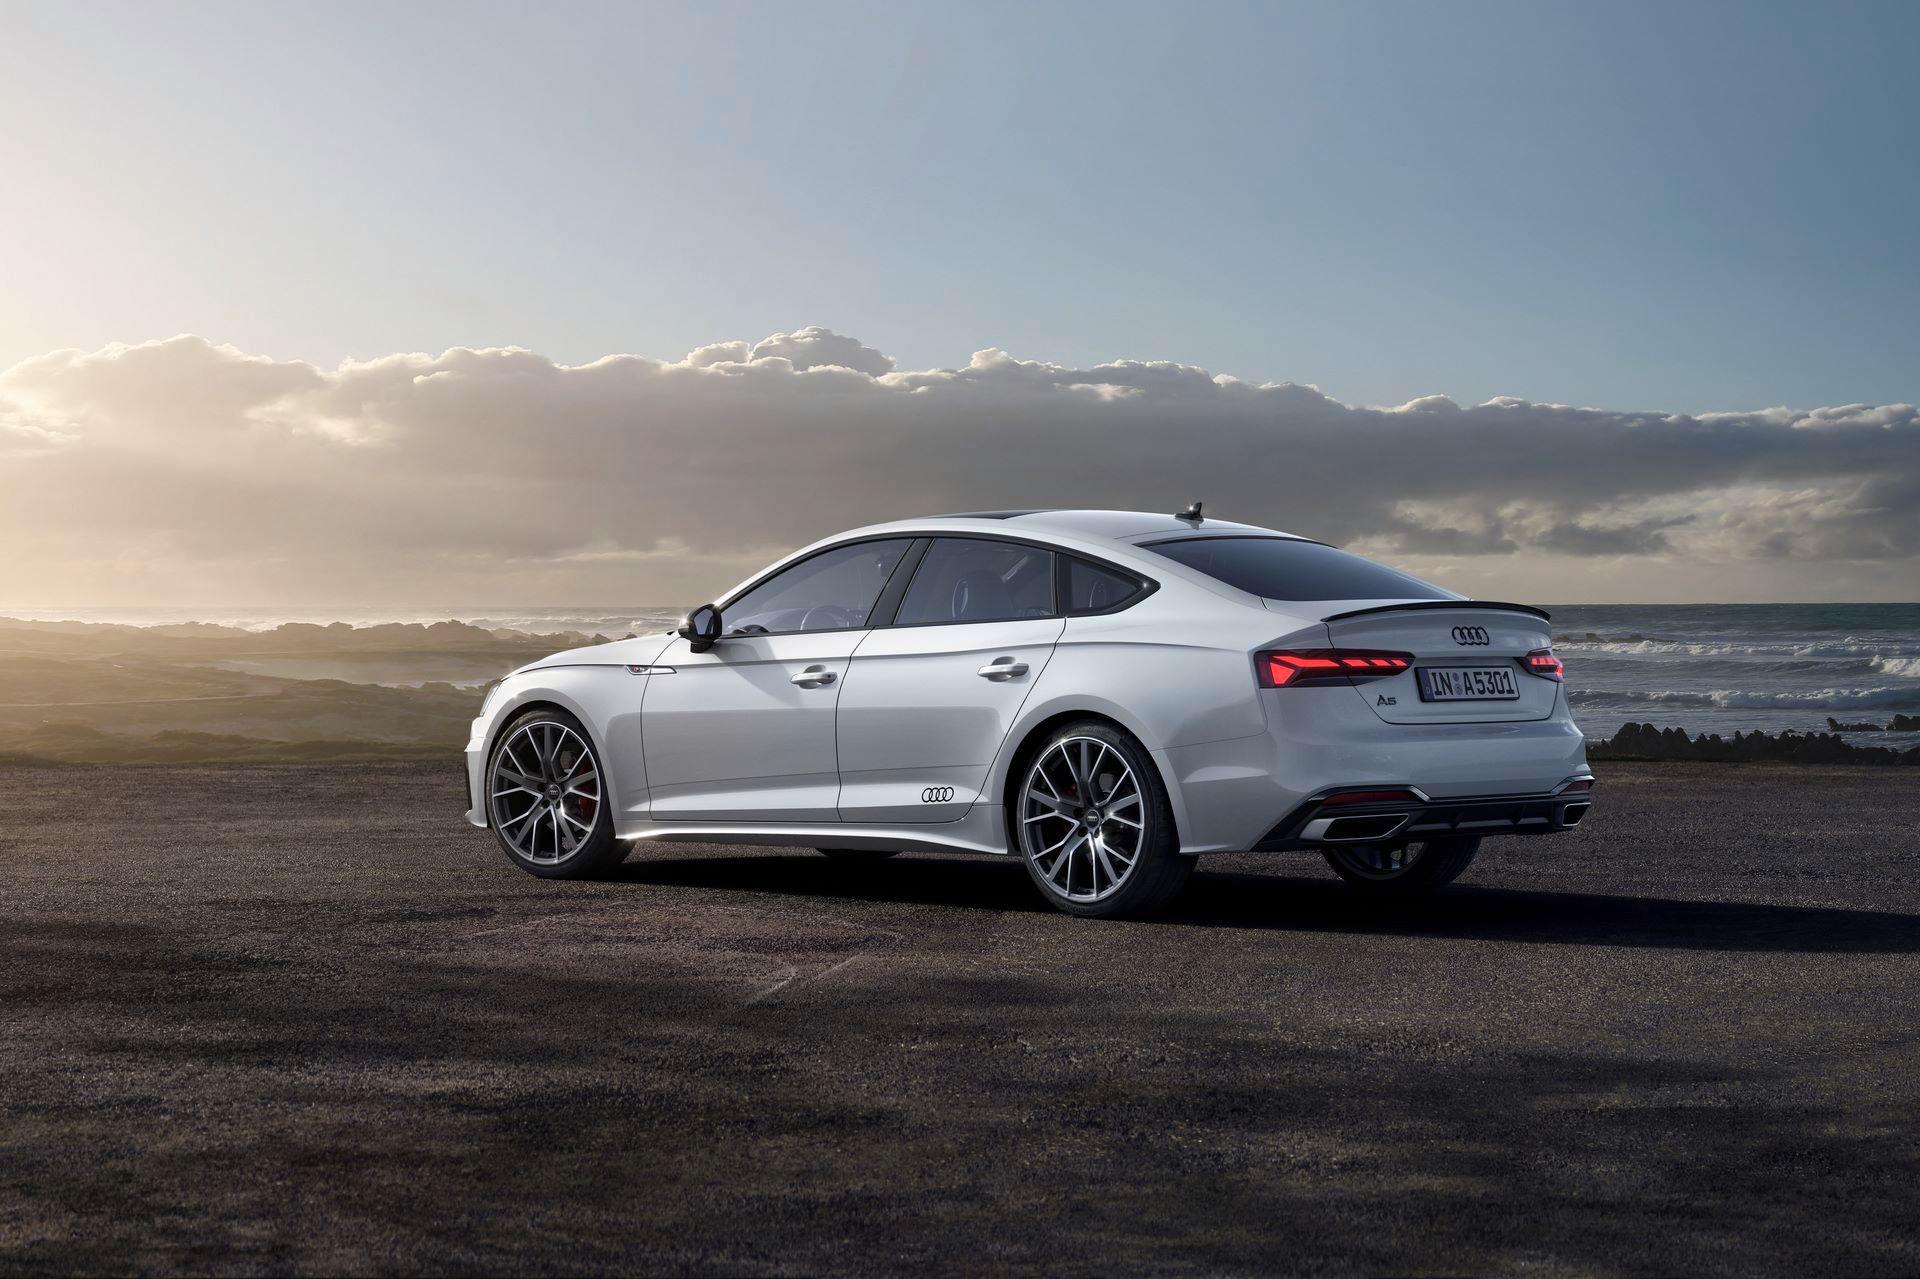 Audi-A4-A5-Q7-Q8-Competition-And-Competition-Plus-Trims-66